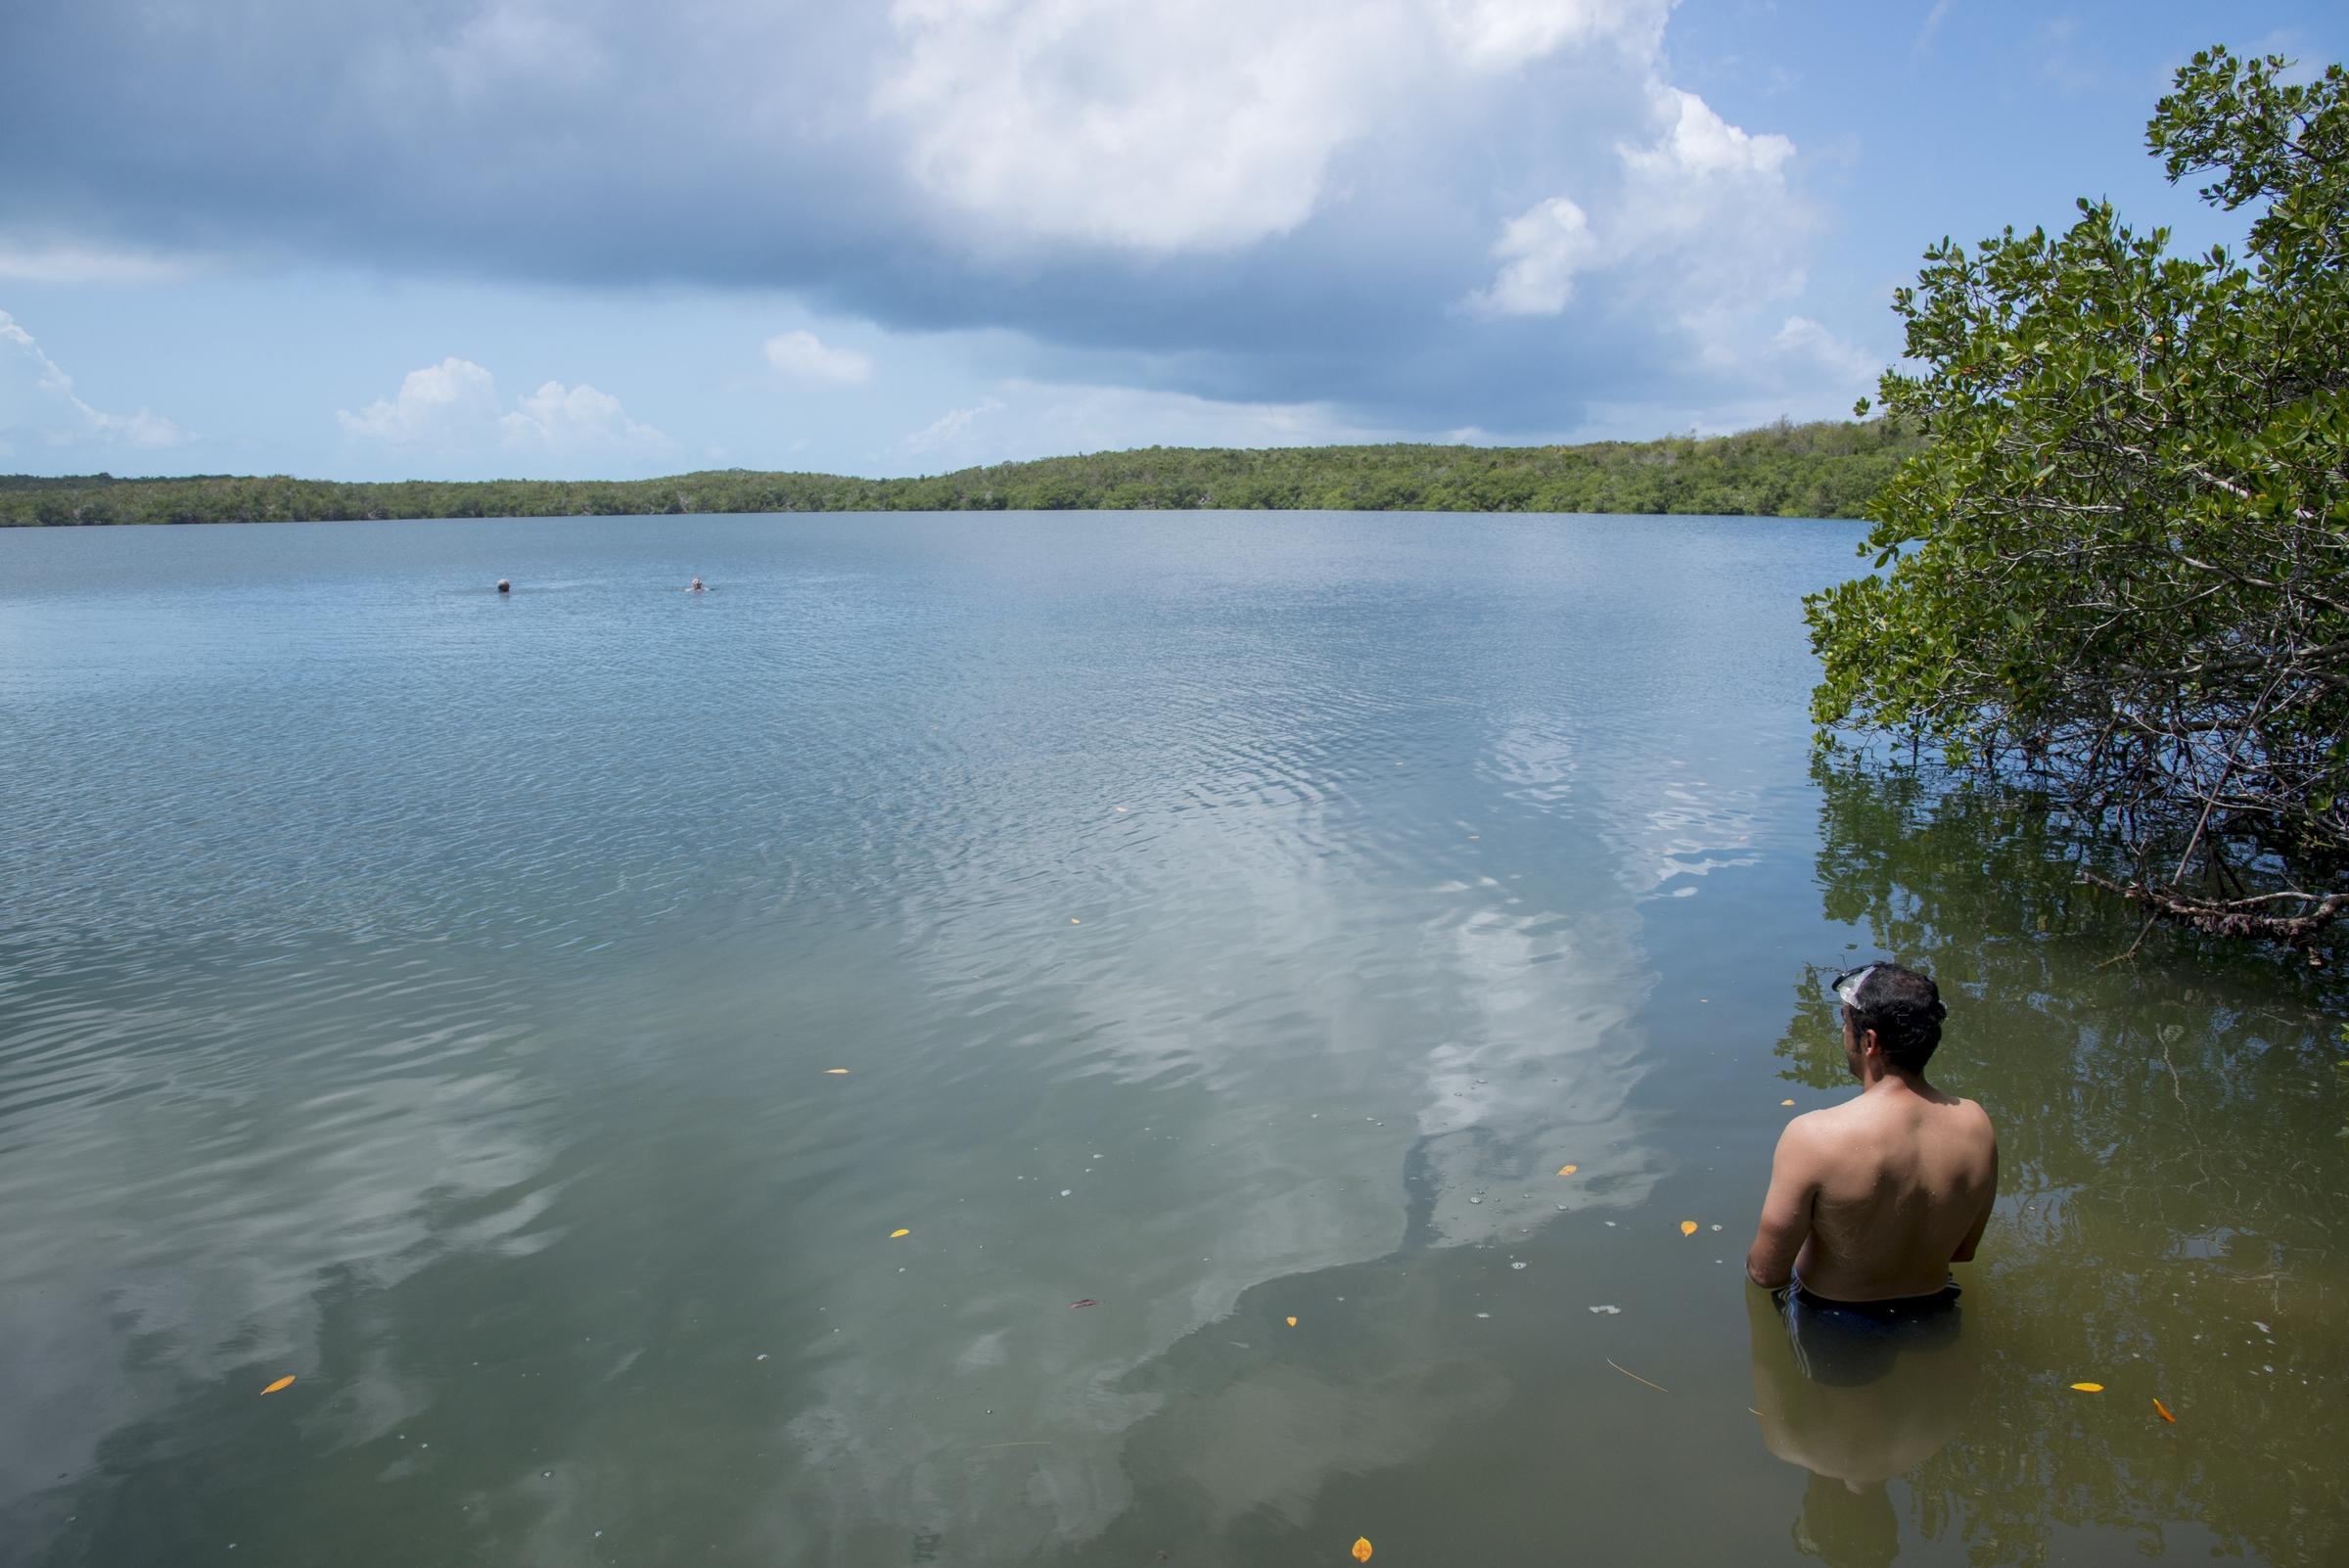 Fernando Bretos snorkeling Turtle Lake. Courtesy of Neil Ever Obsborne, iLCP